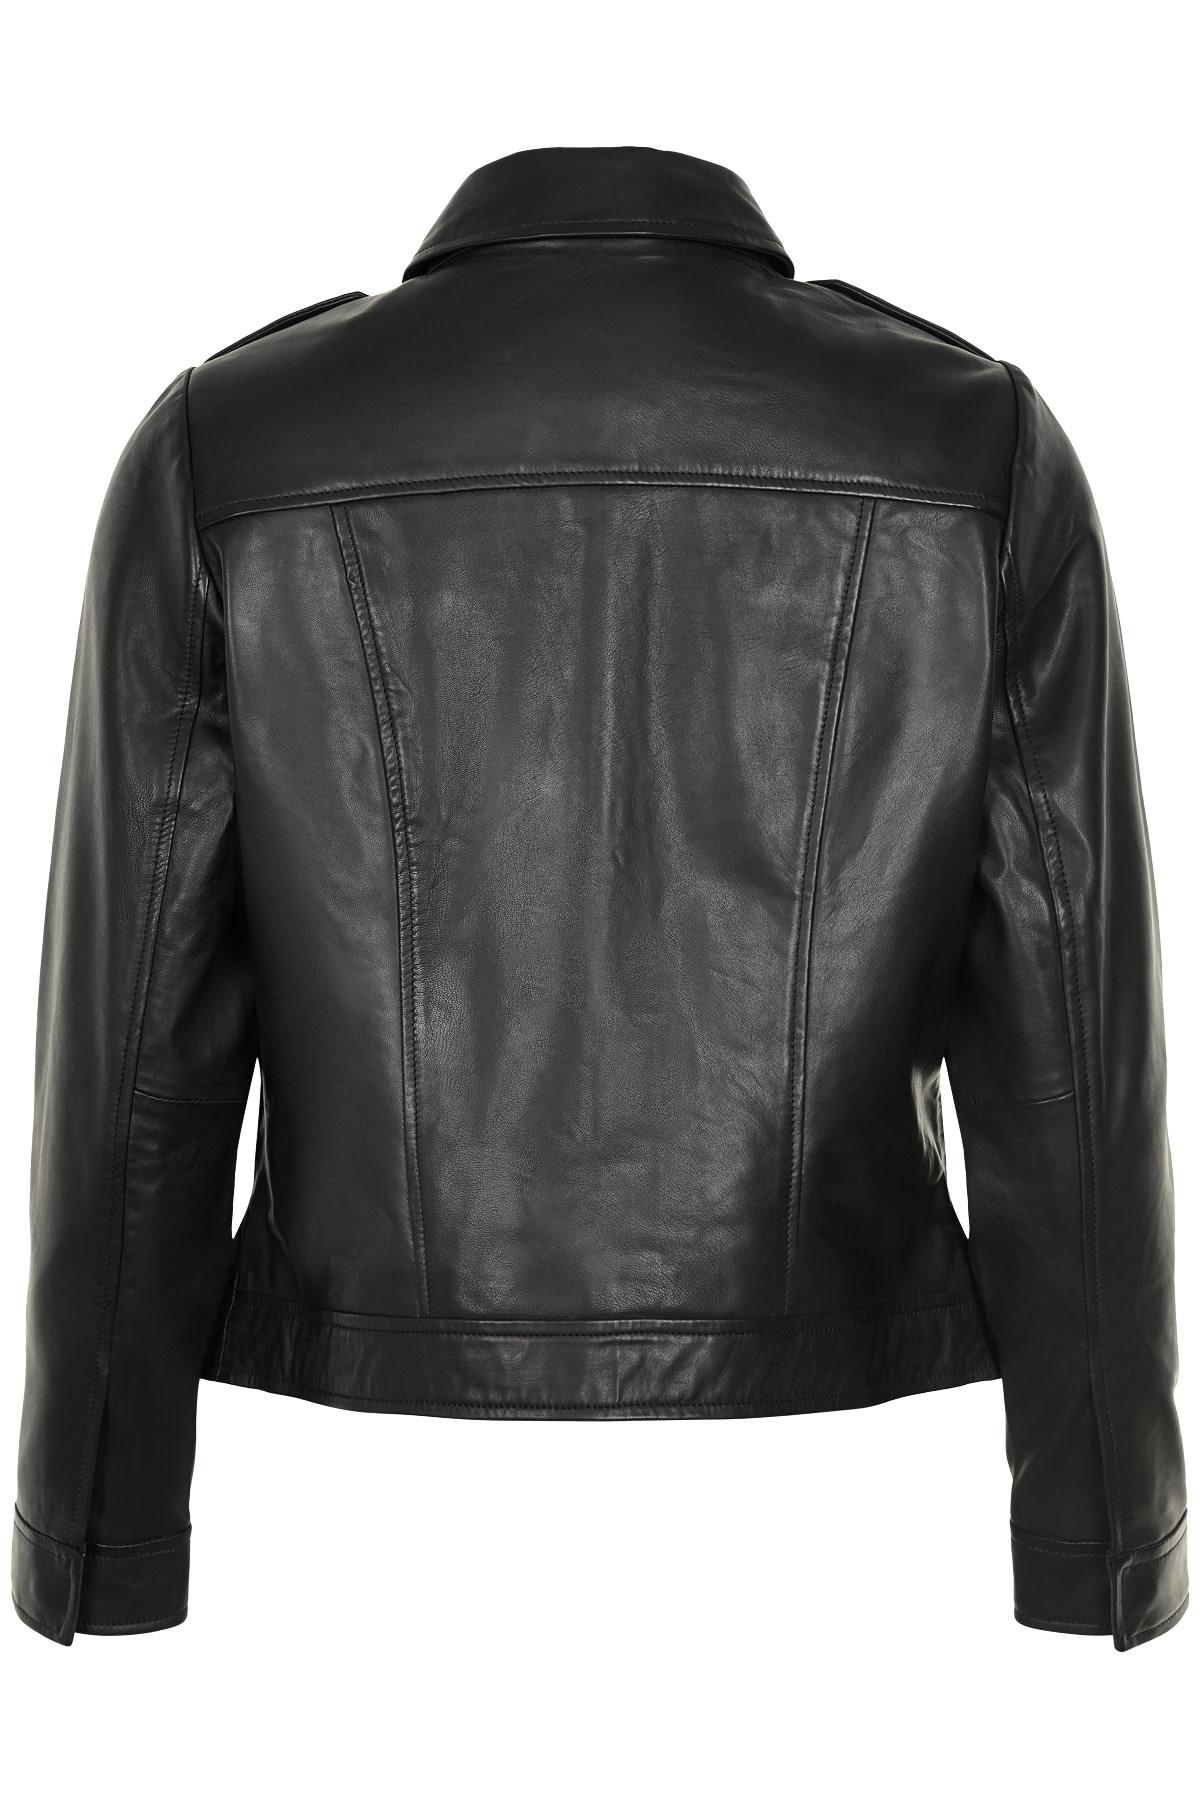 Nümph Lauretta Leather Jacket